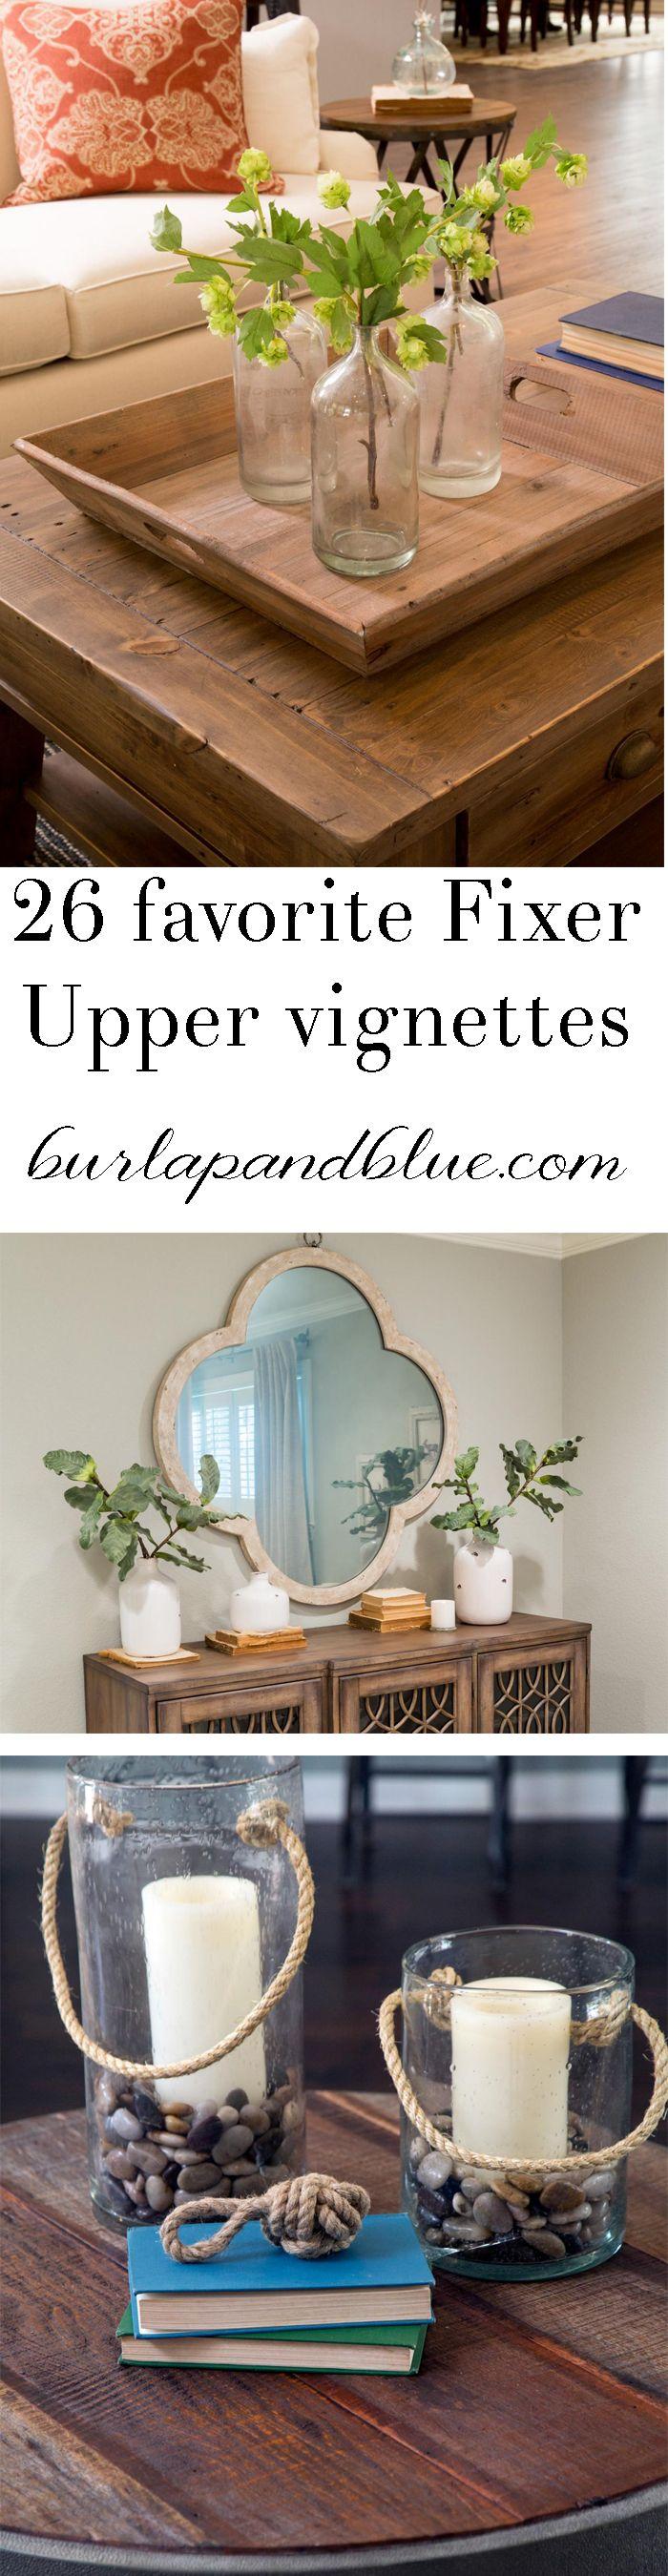 favorite fixer upper vignettes!